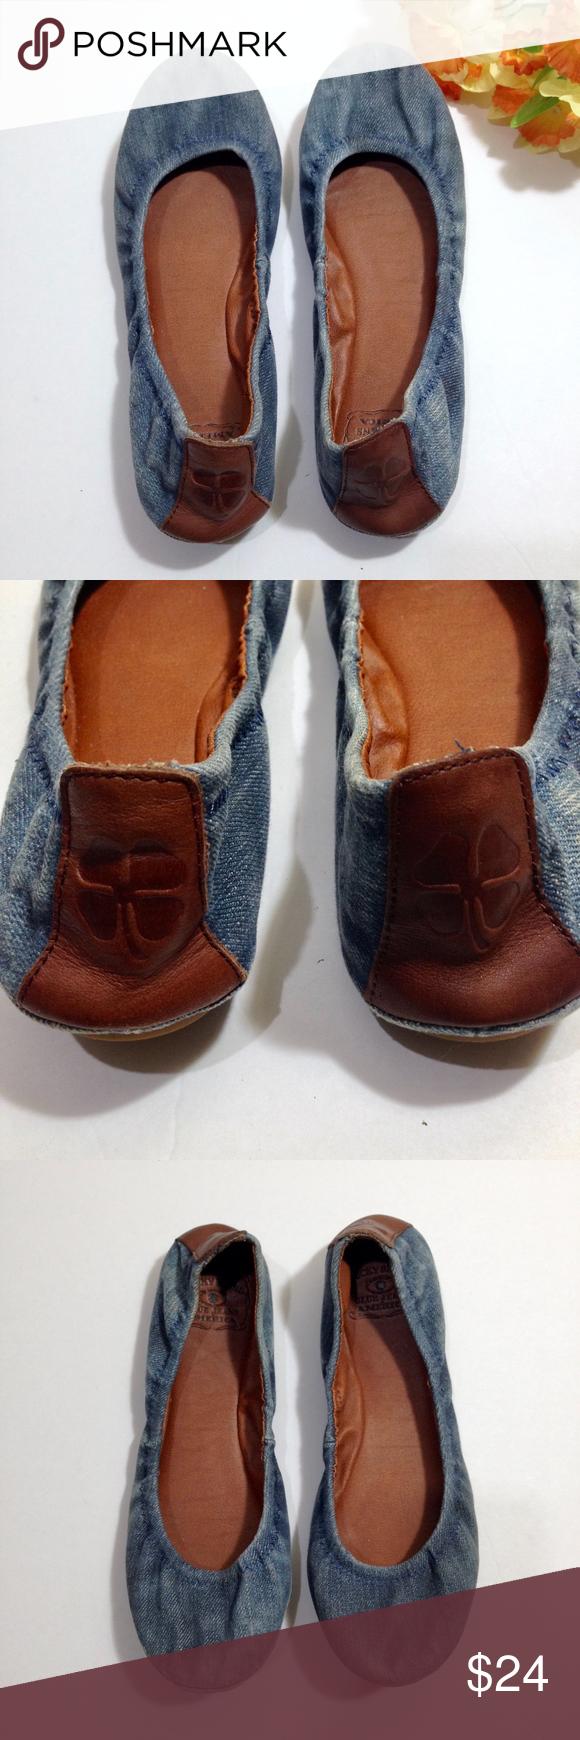 Lucky Brand  Shoes Silver Snake Skin Pattern - Very Nice and Stylish Sz. 7.5